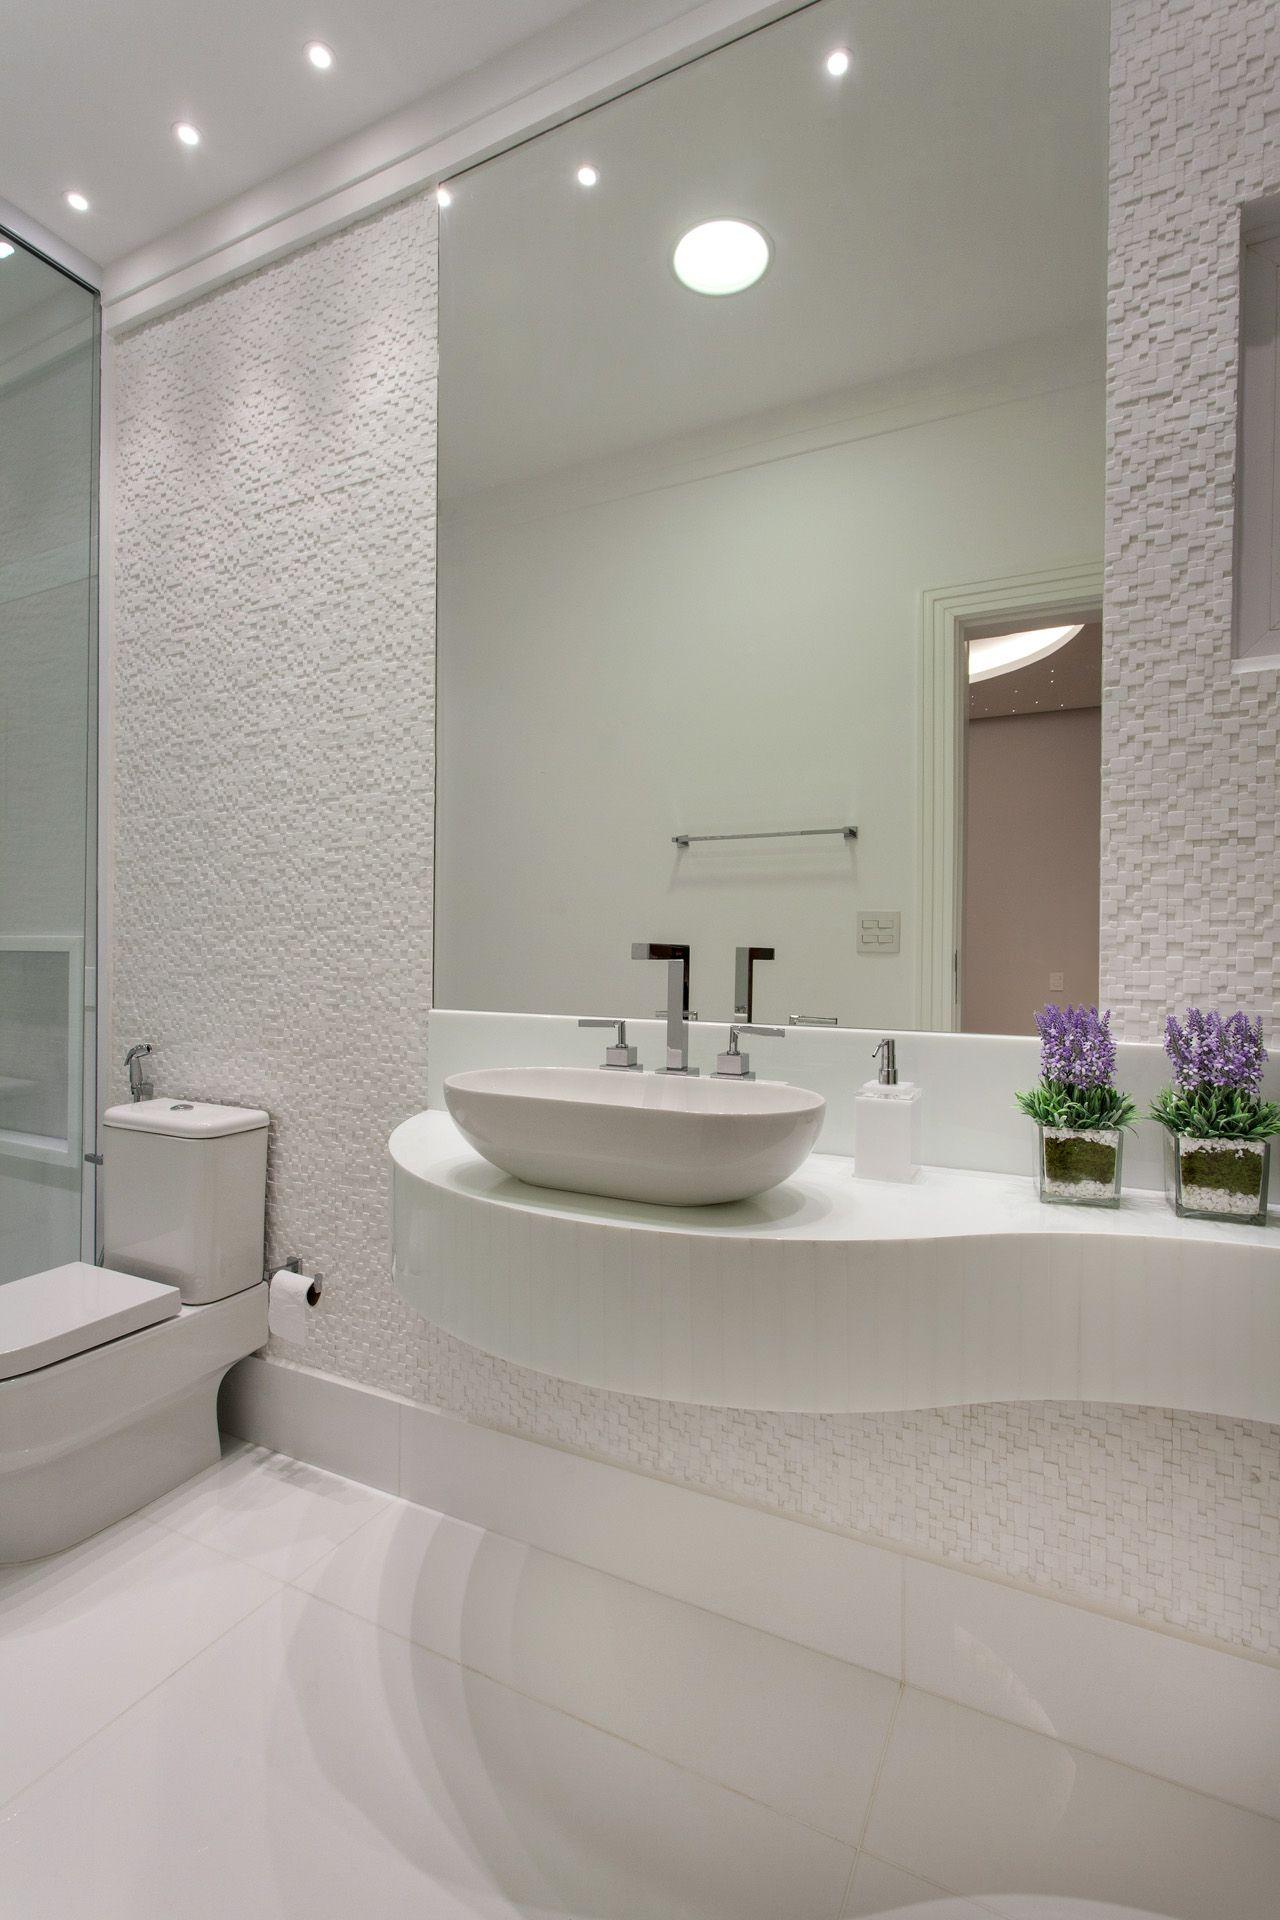 Arquiteto  Aquiles N Colas K Laris Powder Roomscocoonshower Roomsmodern